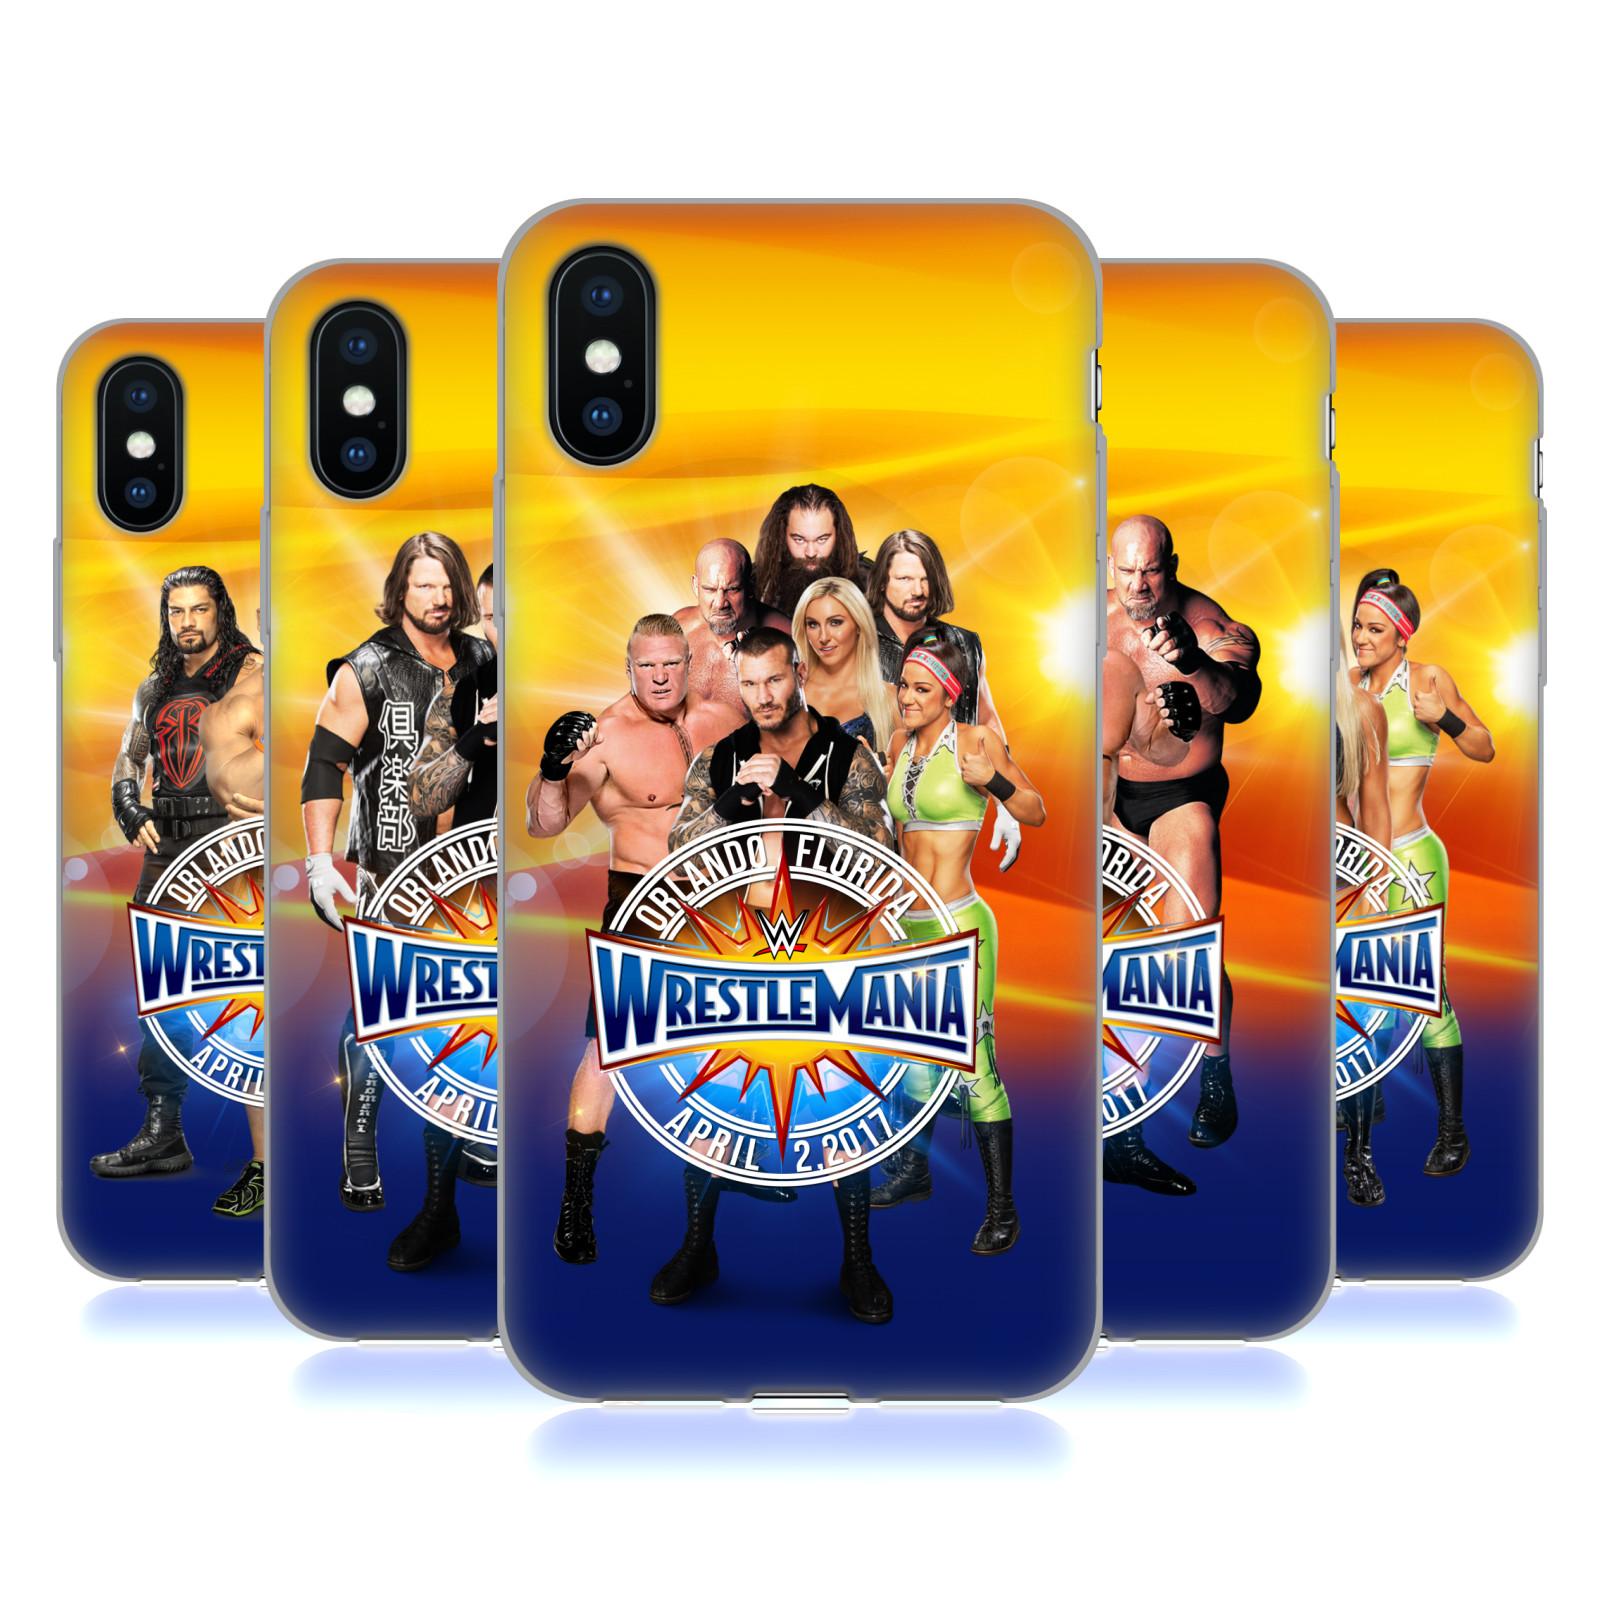 WWE Wrestlemania 33 Superstars